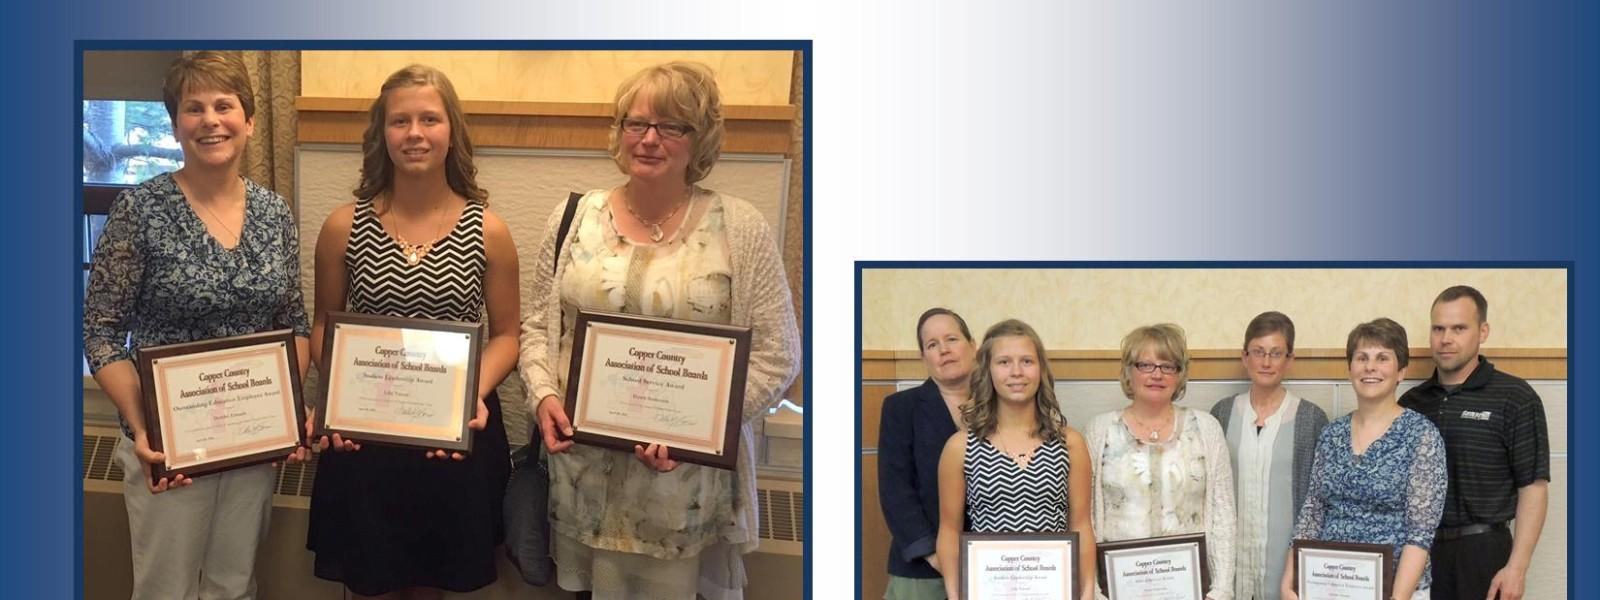 CCASB Award Winners 2016